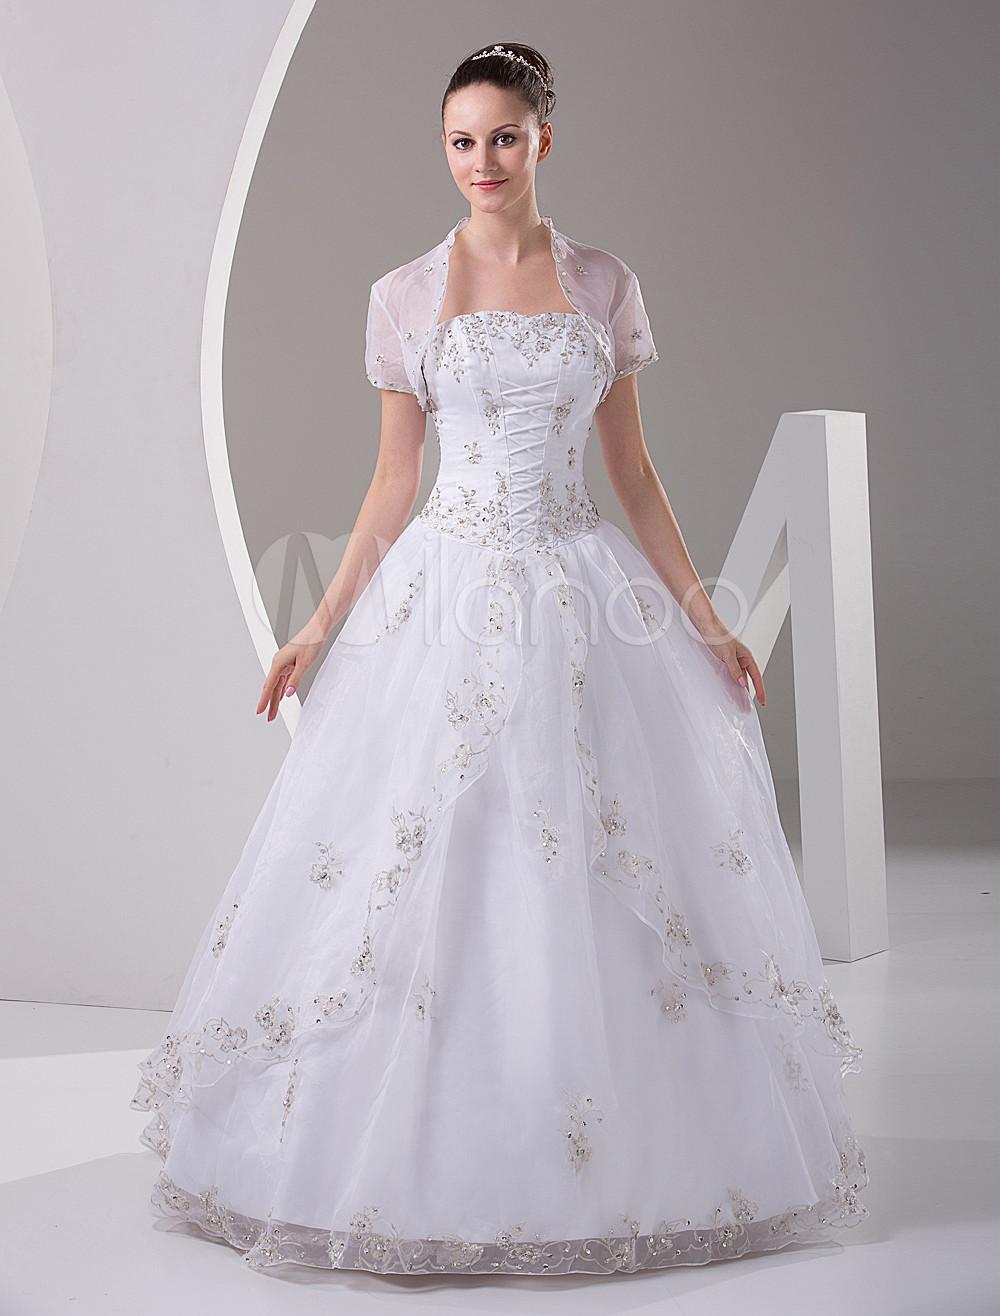 b5e8b56b282 White Quinceanera Dress Strapless Satin Organza Dress - Milanoo.com